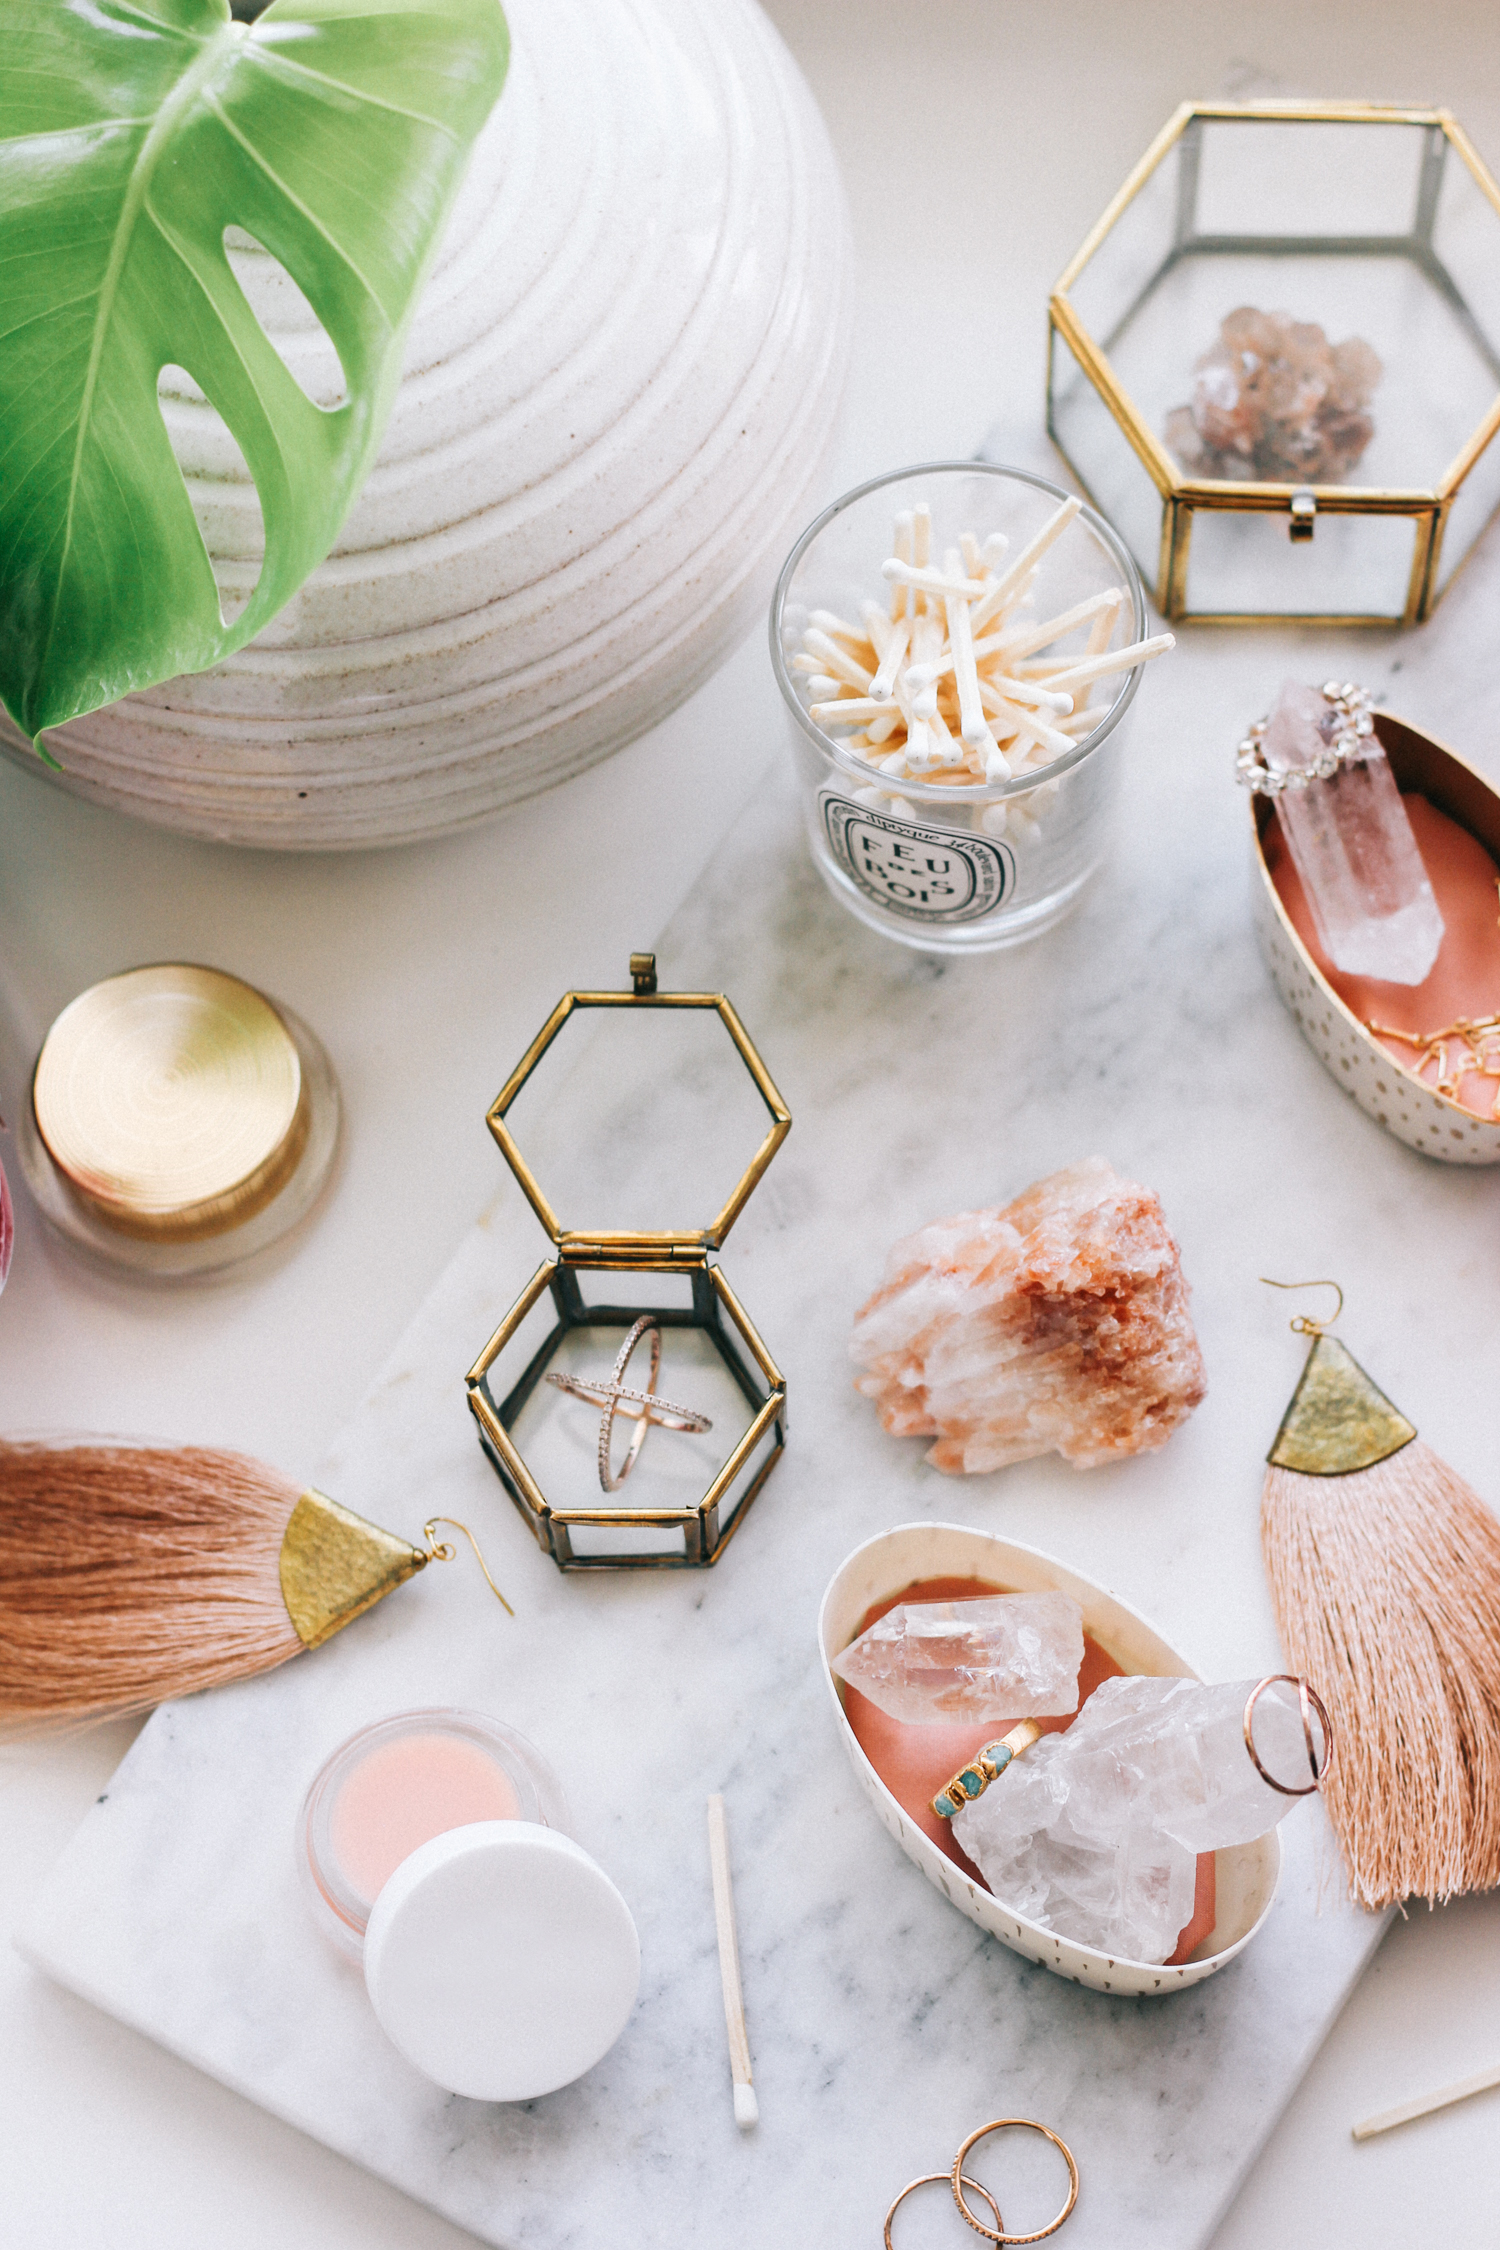 Jewelry + beauty product organization DIY | A Fabulous Fete